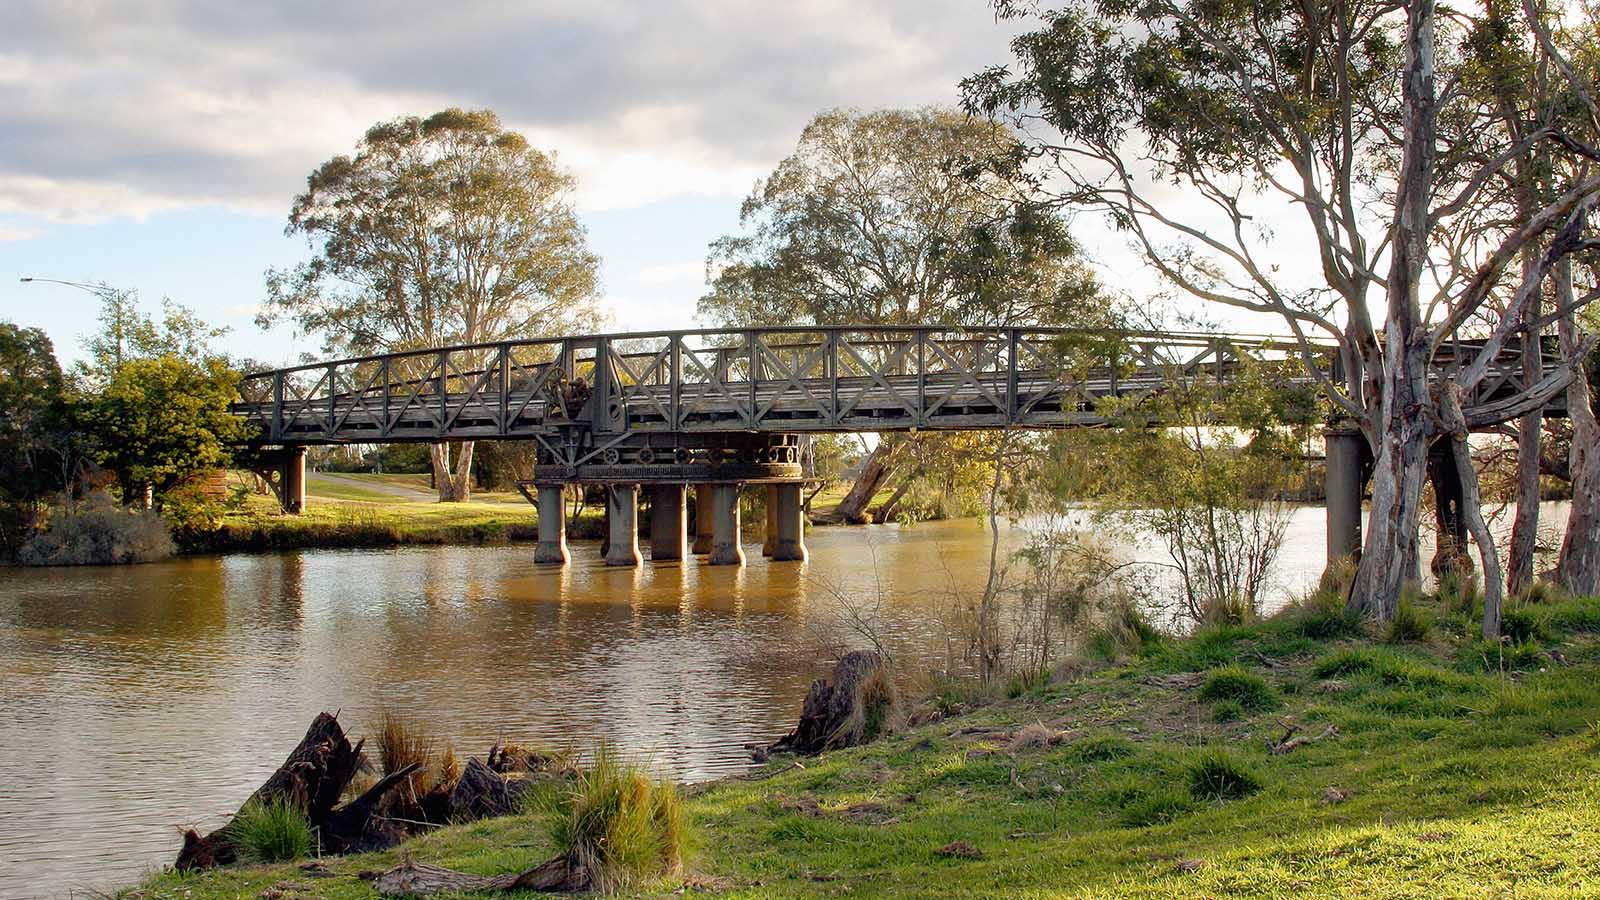 Sale Swing Bridge, Gippsland, Victoria, Australia